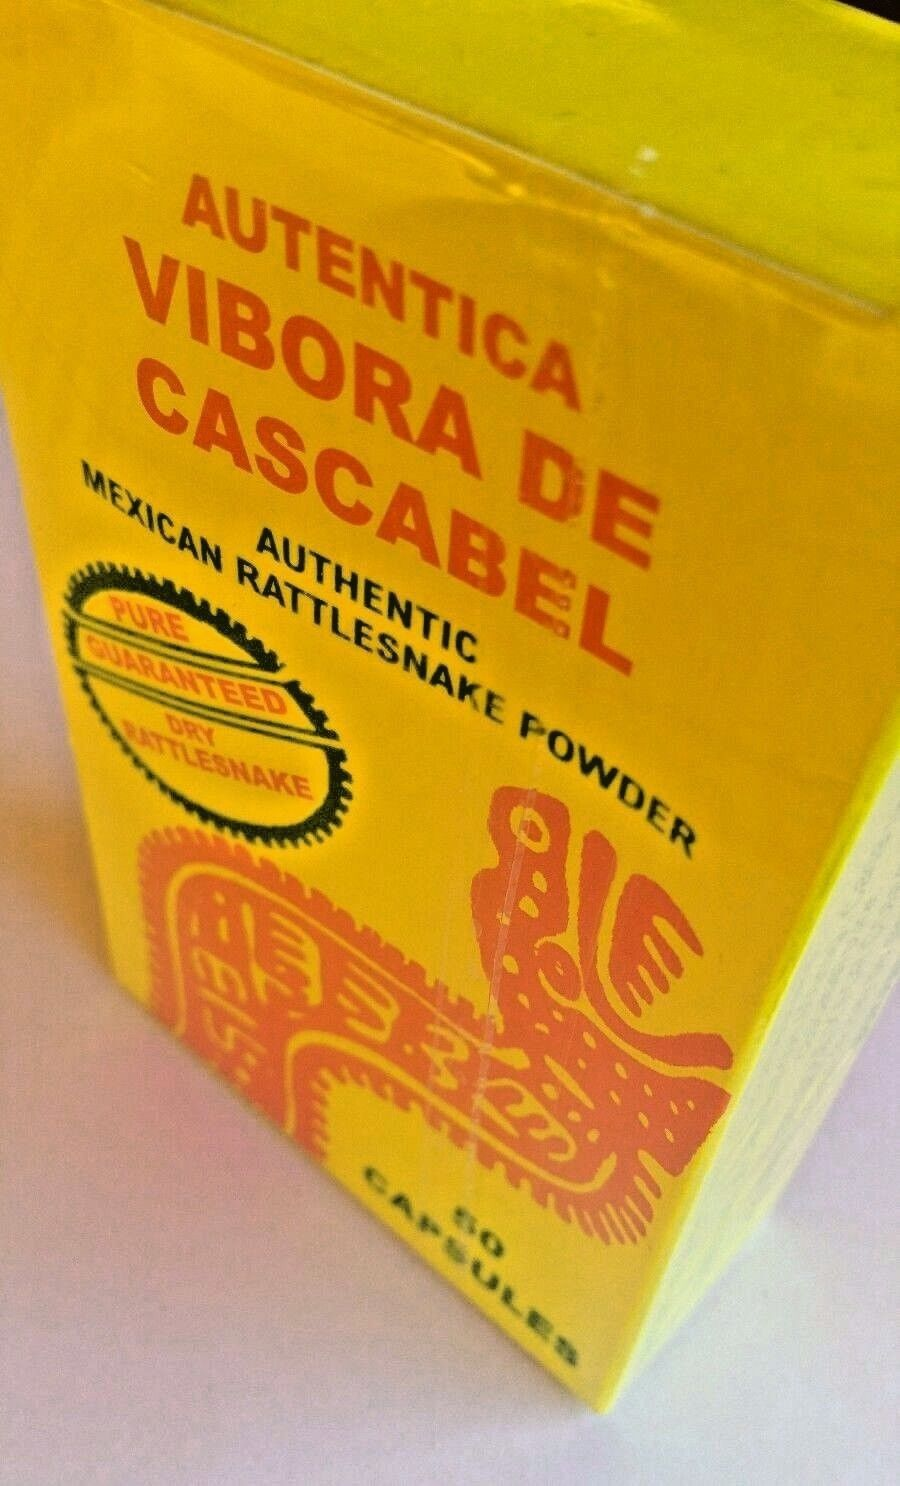 3 Rattlesnake Vibora de Cascabel 150 Capsules + 3 Jabon Vibora Cascabel 4.93 oz 8